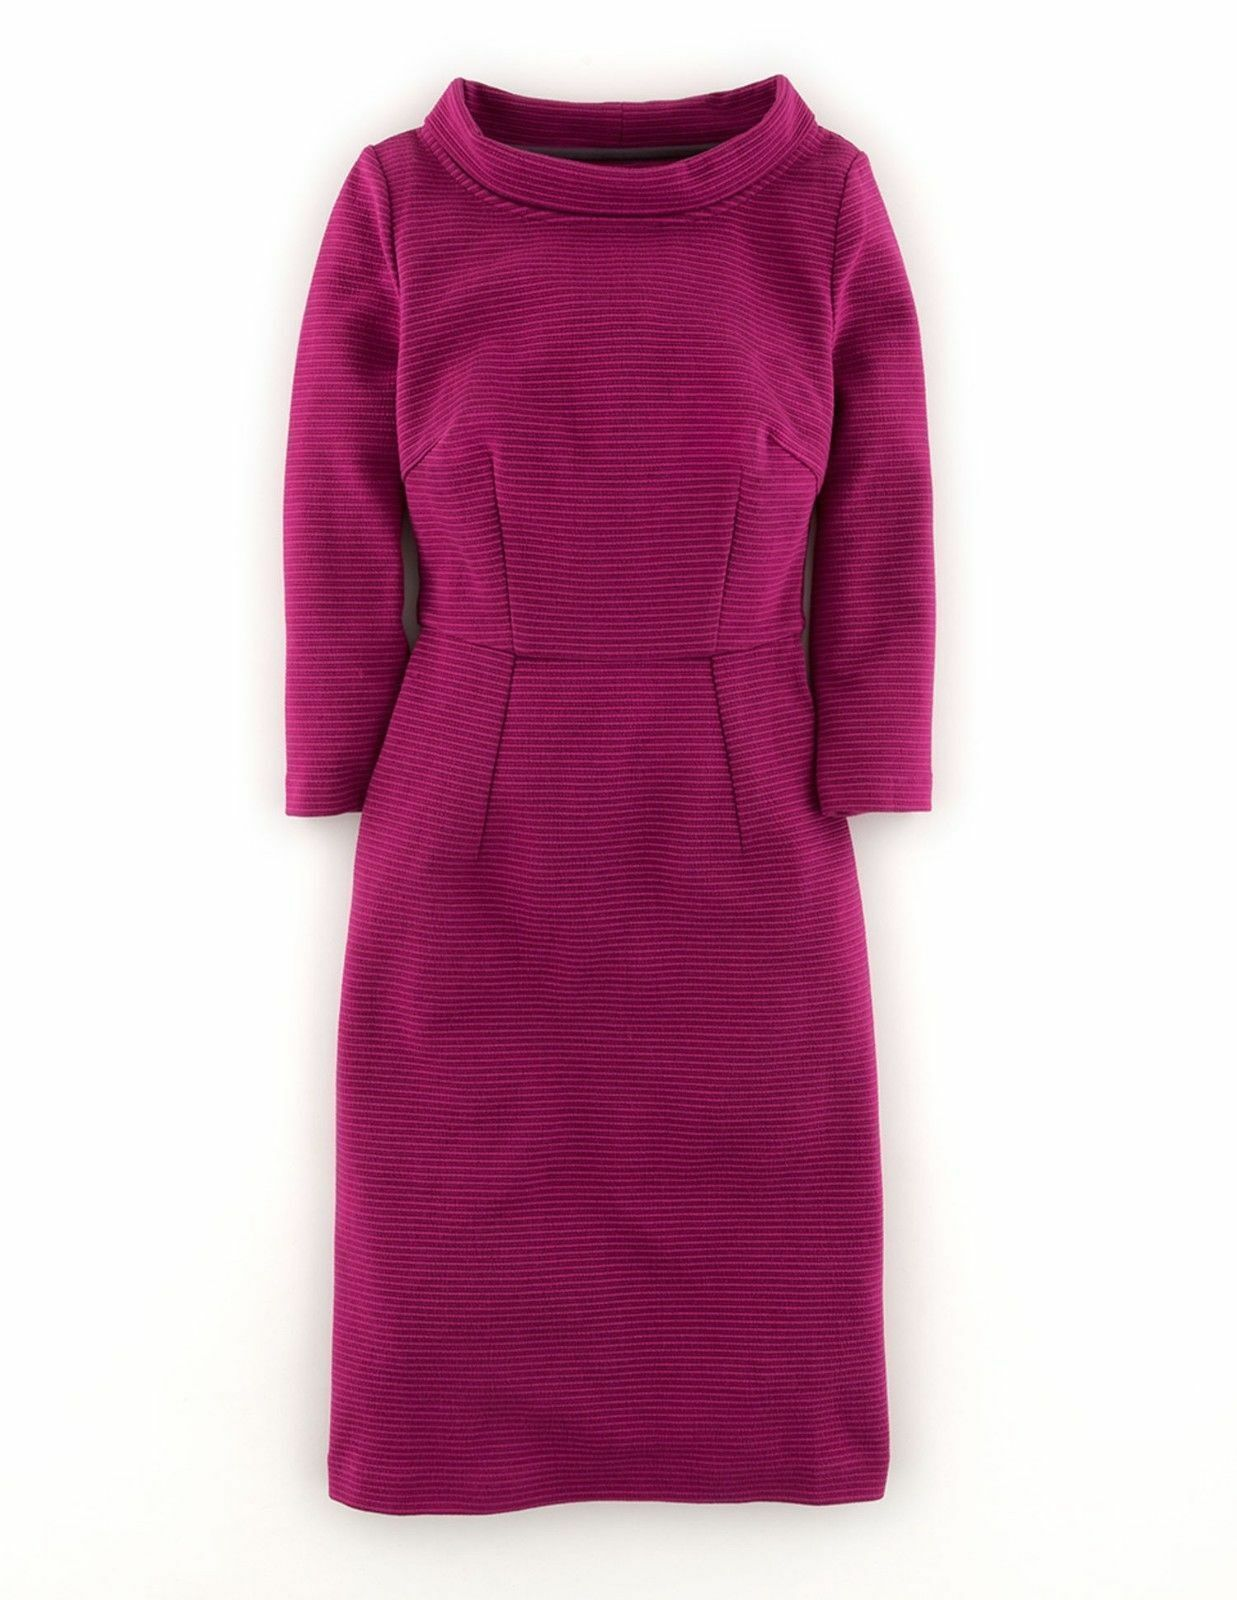 NEW Org  238 Boden Rich Purple Magenta Zoe Dess Size US 2